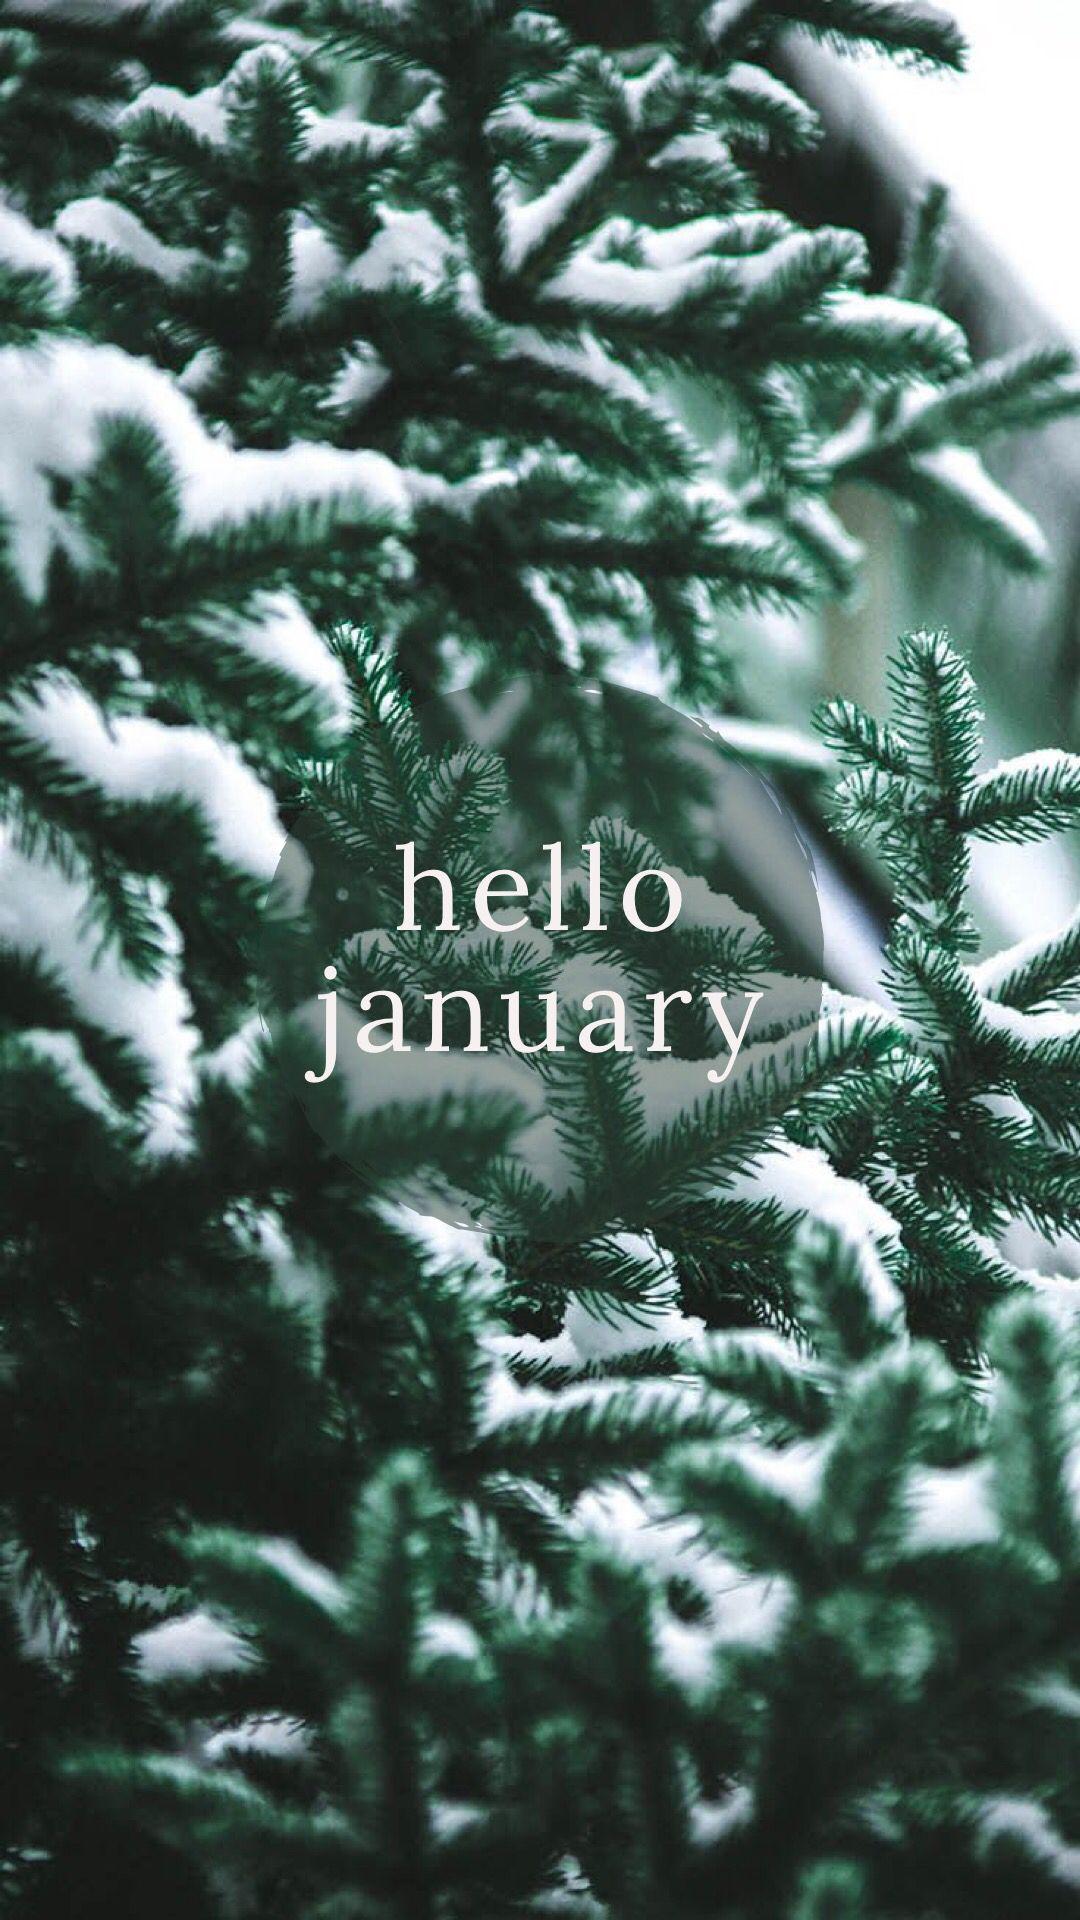 january wallpaper